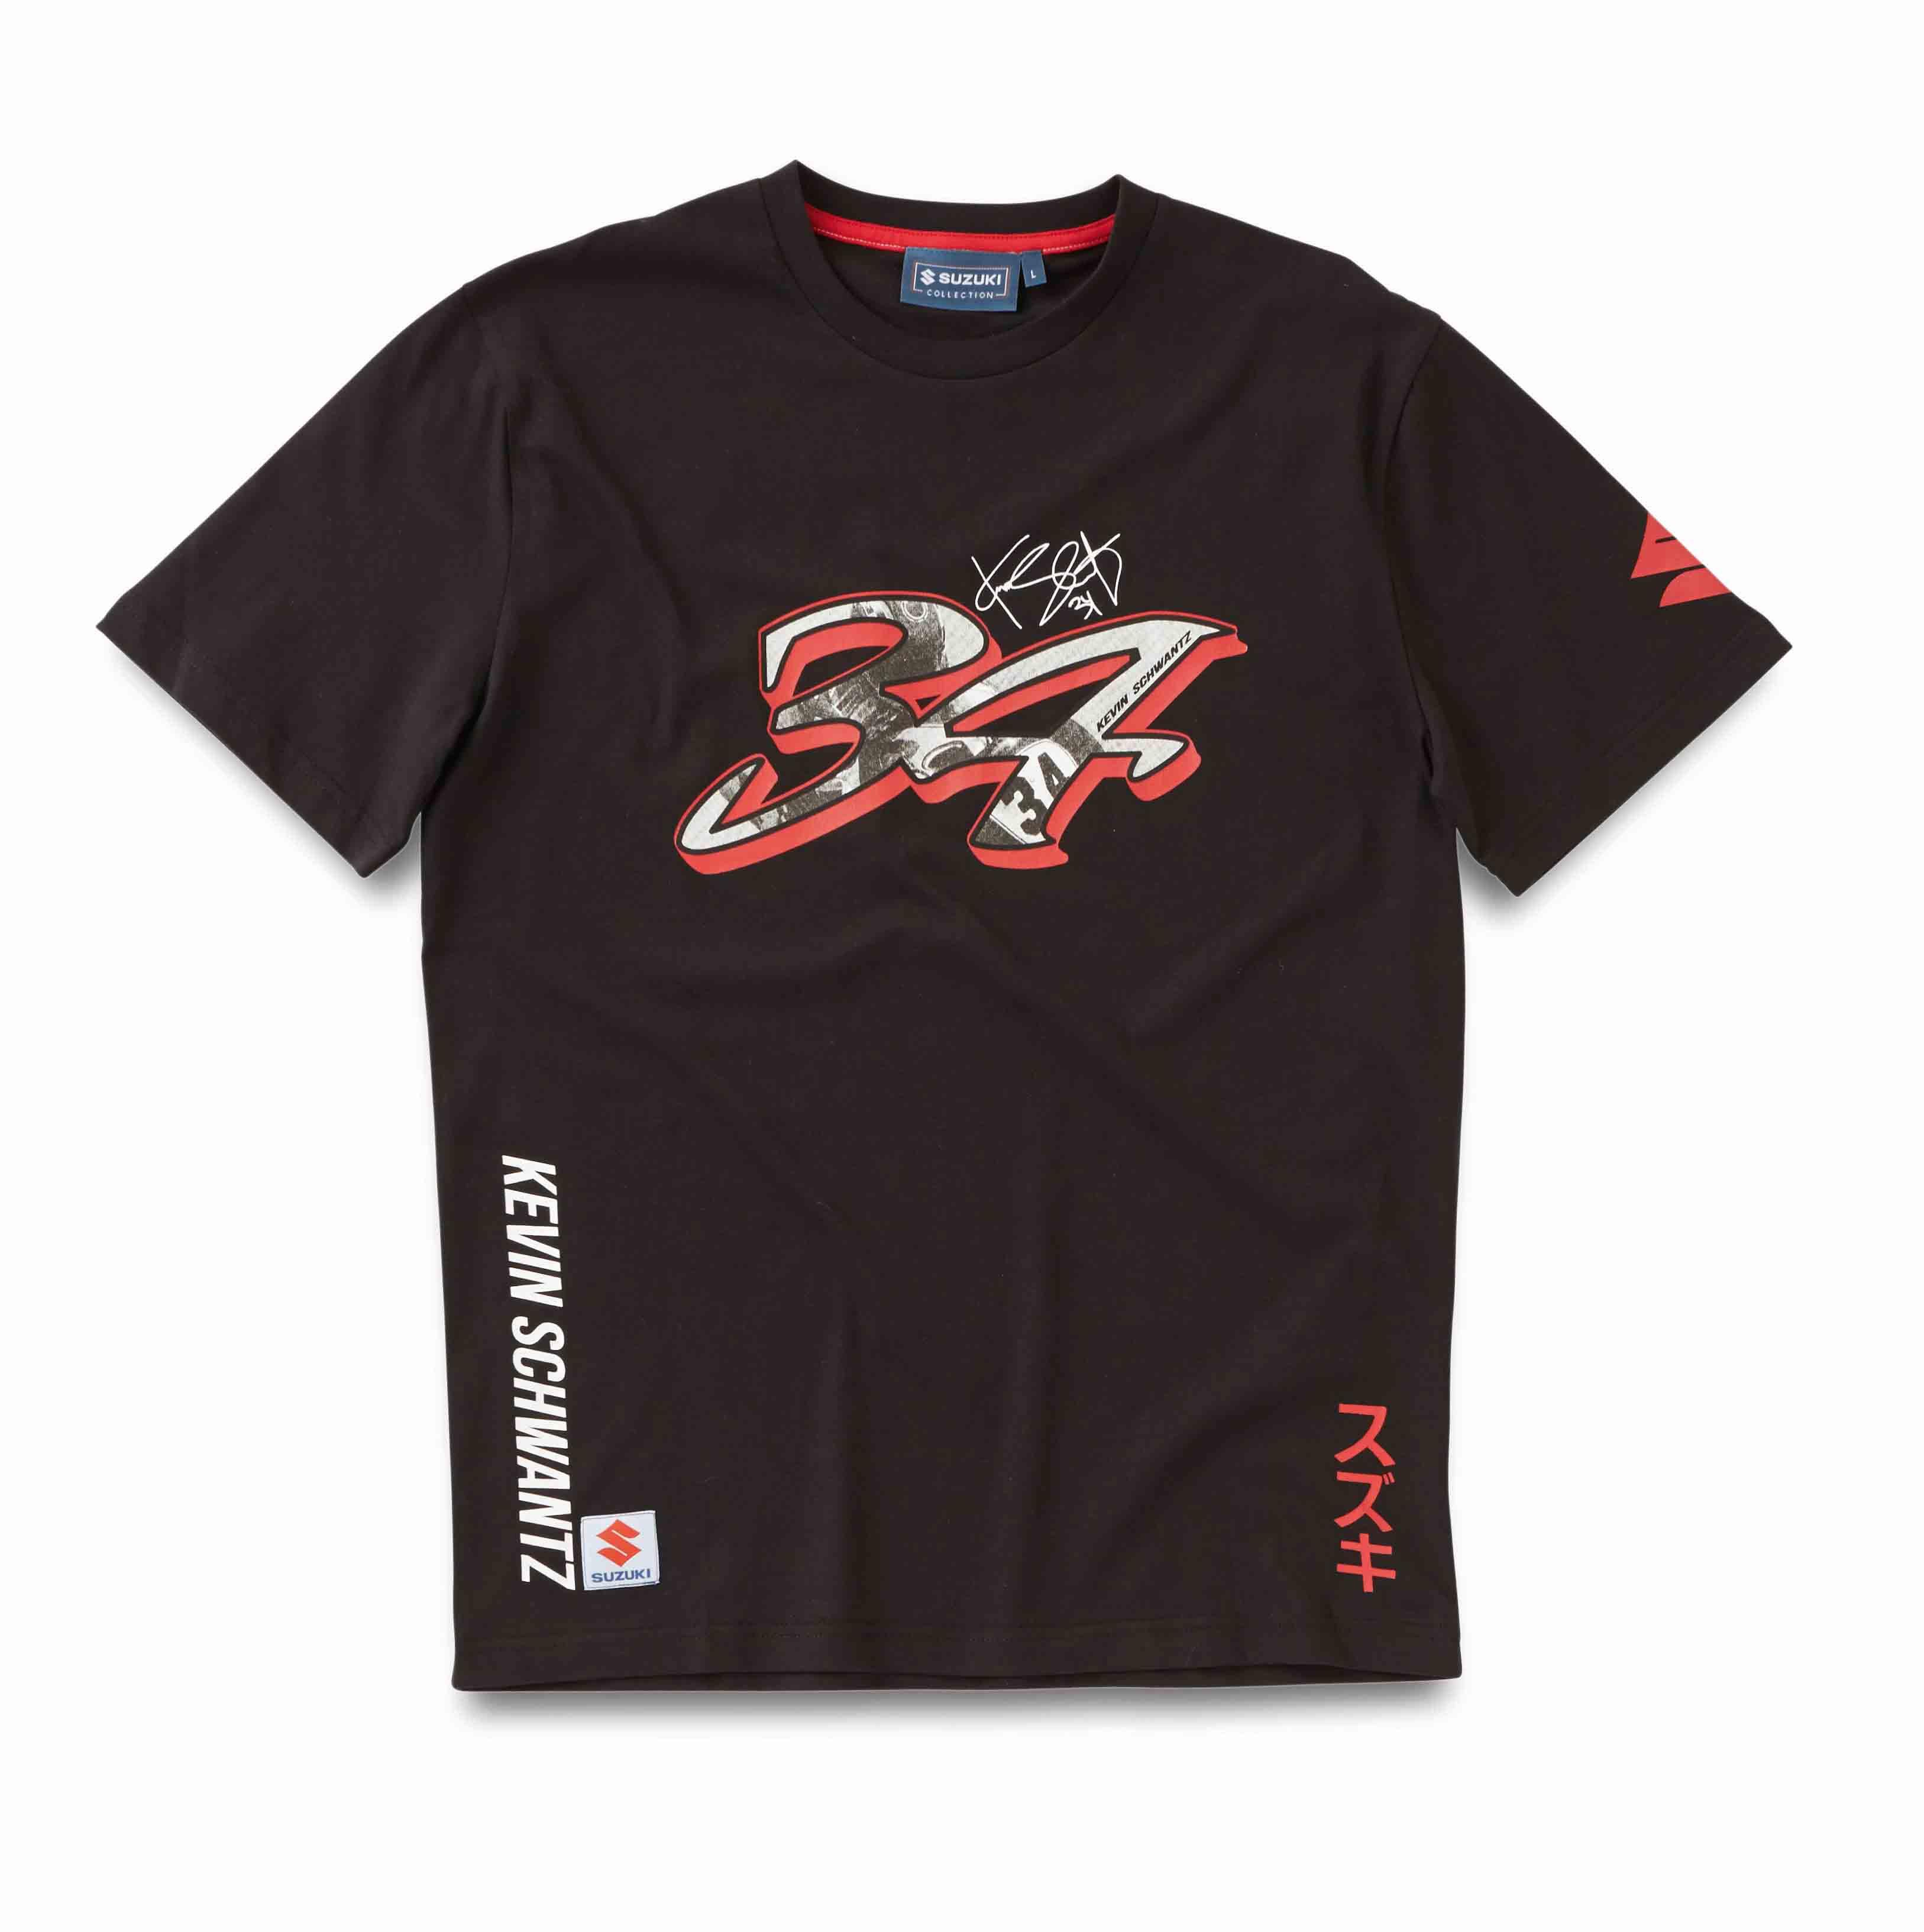 genuine suzuki n34 mens black t shirt kevin schwantz short. Black Bedroom Furniture Sets. Home Design Ideas